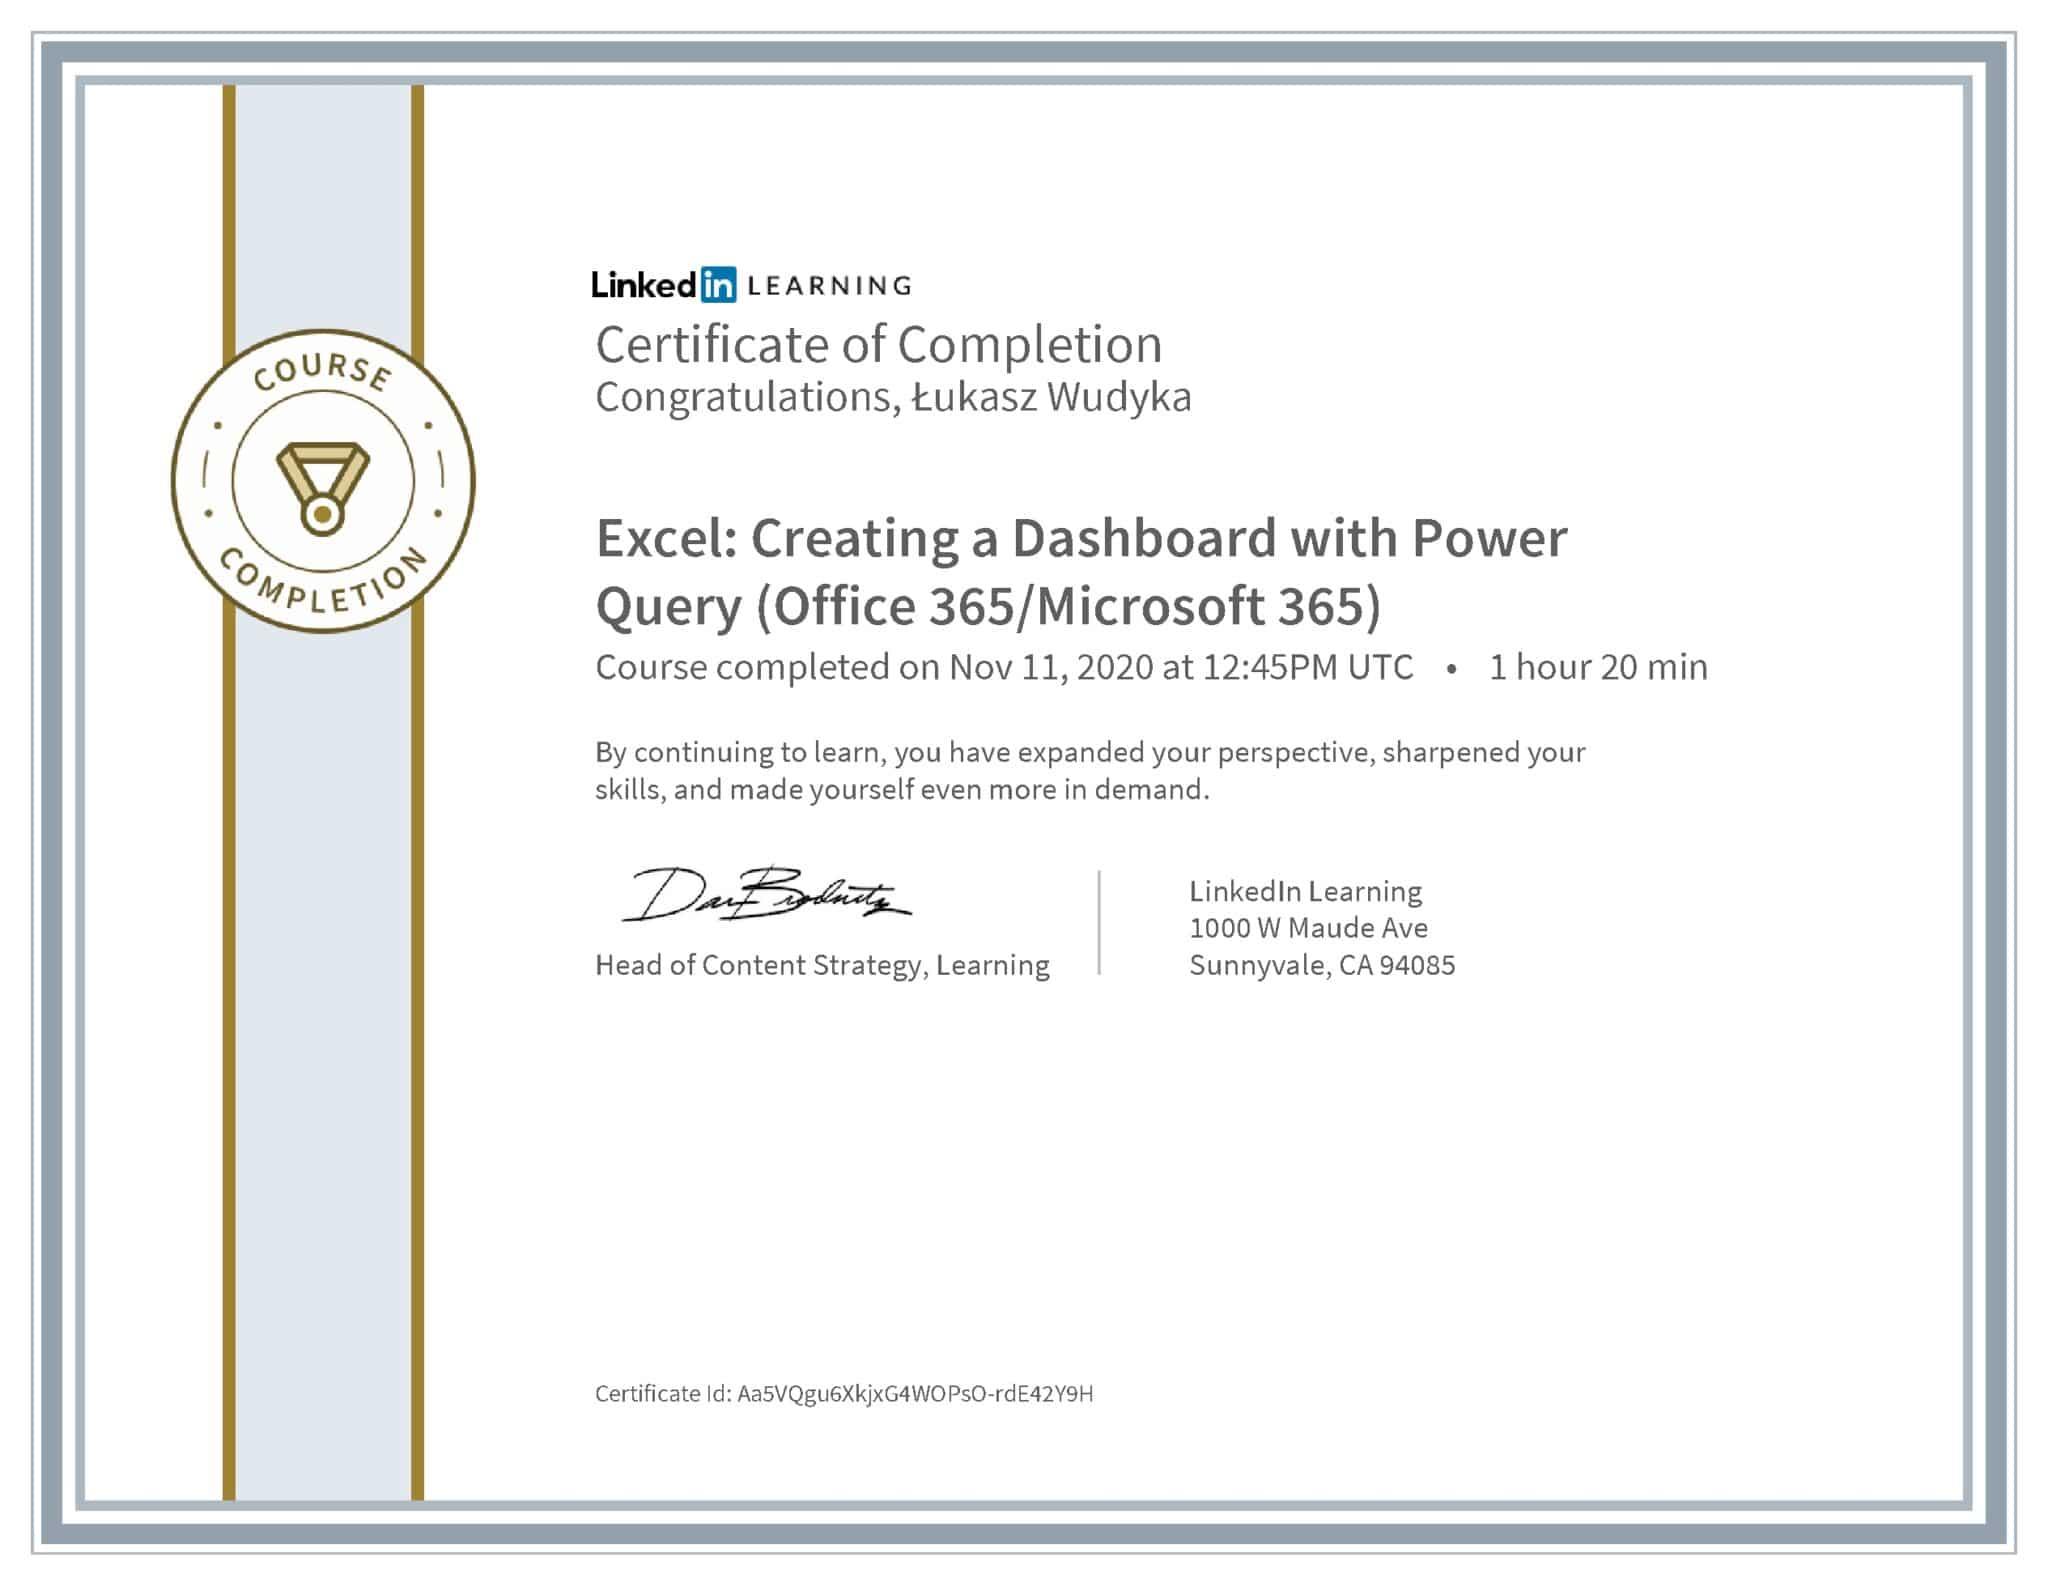 Łukasz Wudyka certyfikat LinkedIn Excel: Creating a Dashboard with Power Query (Office 365/Microsoft 365)